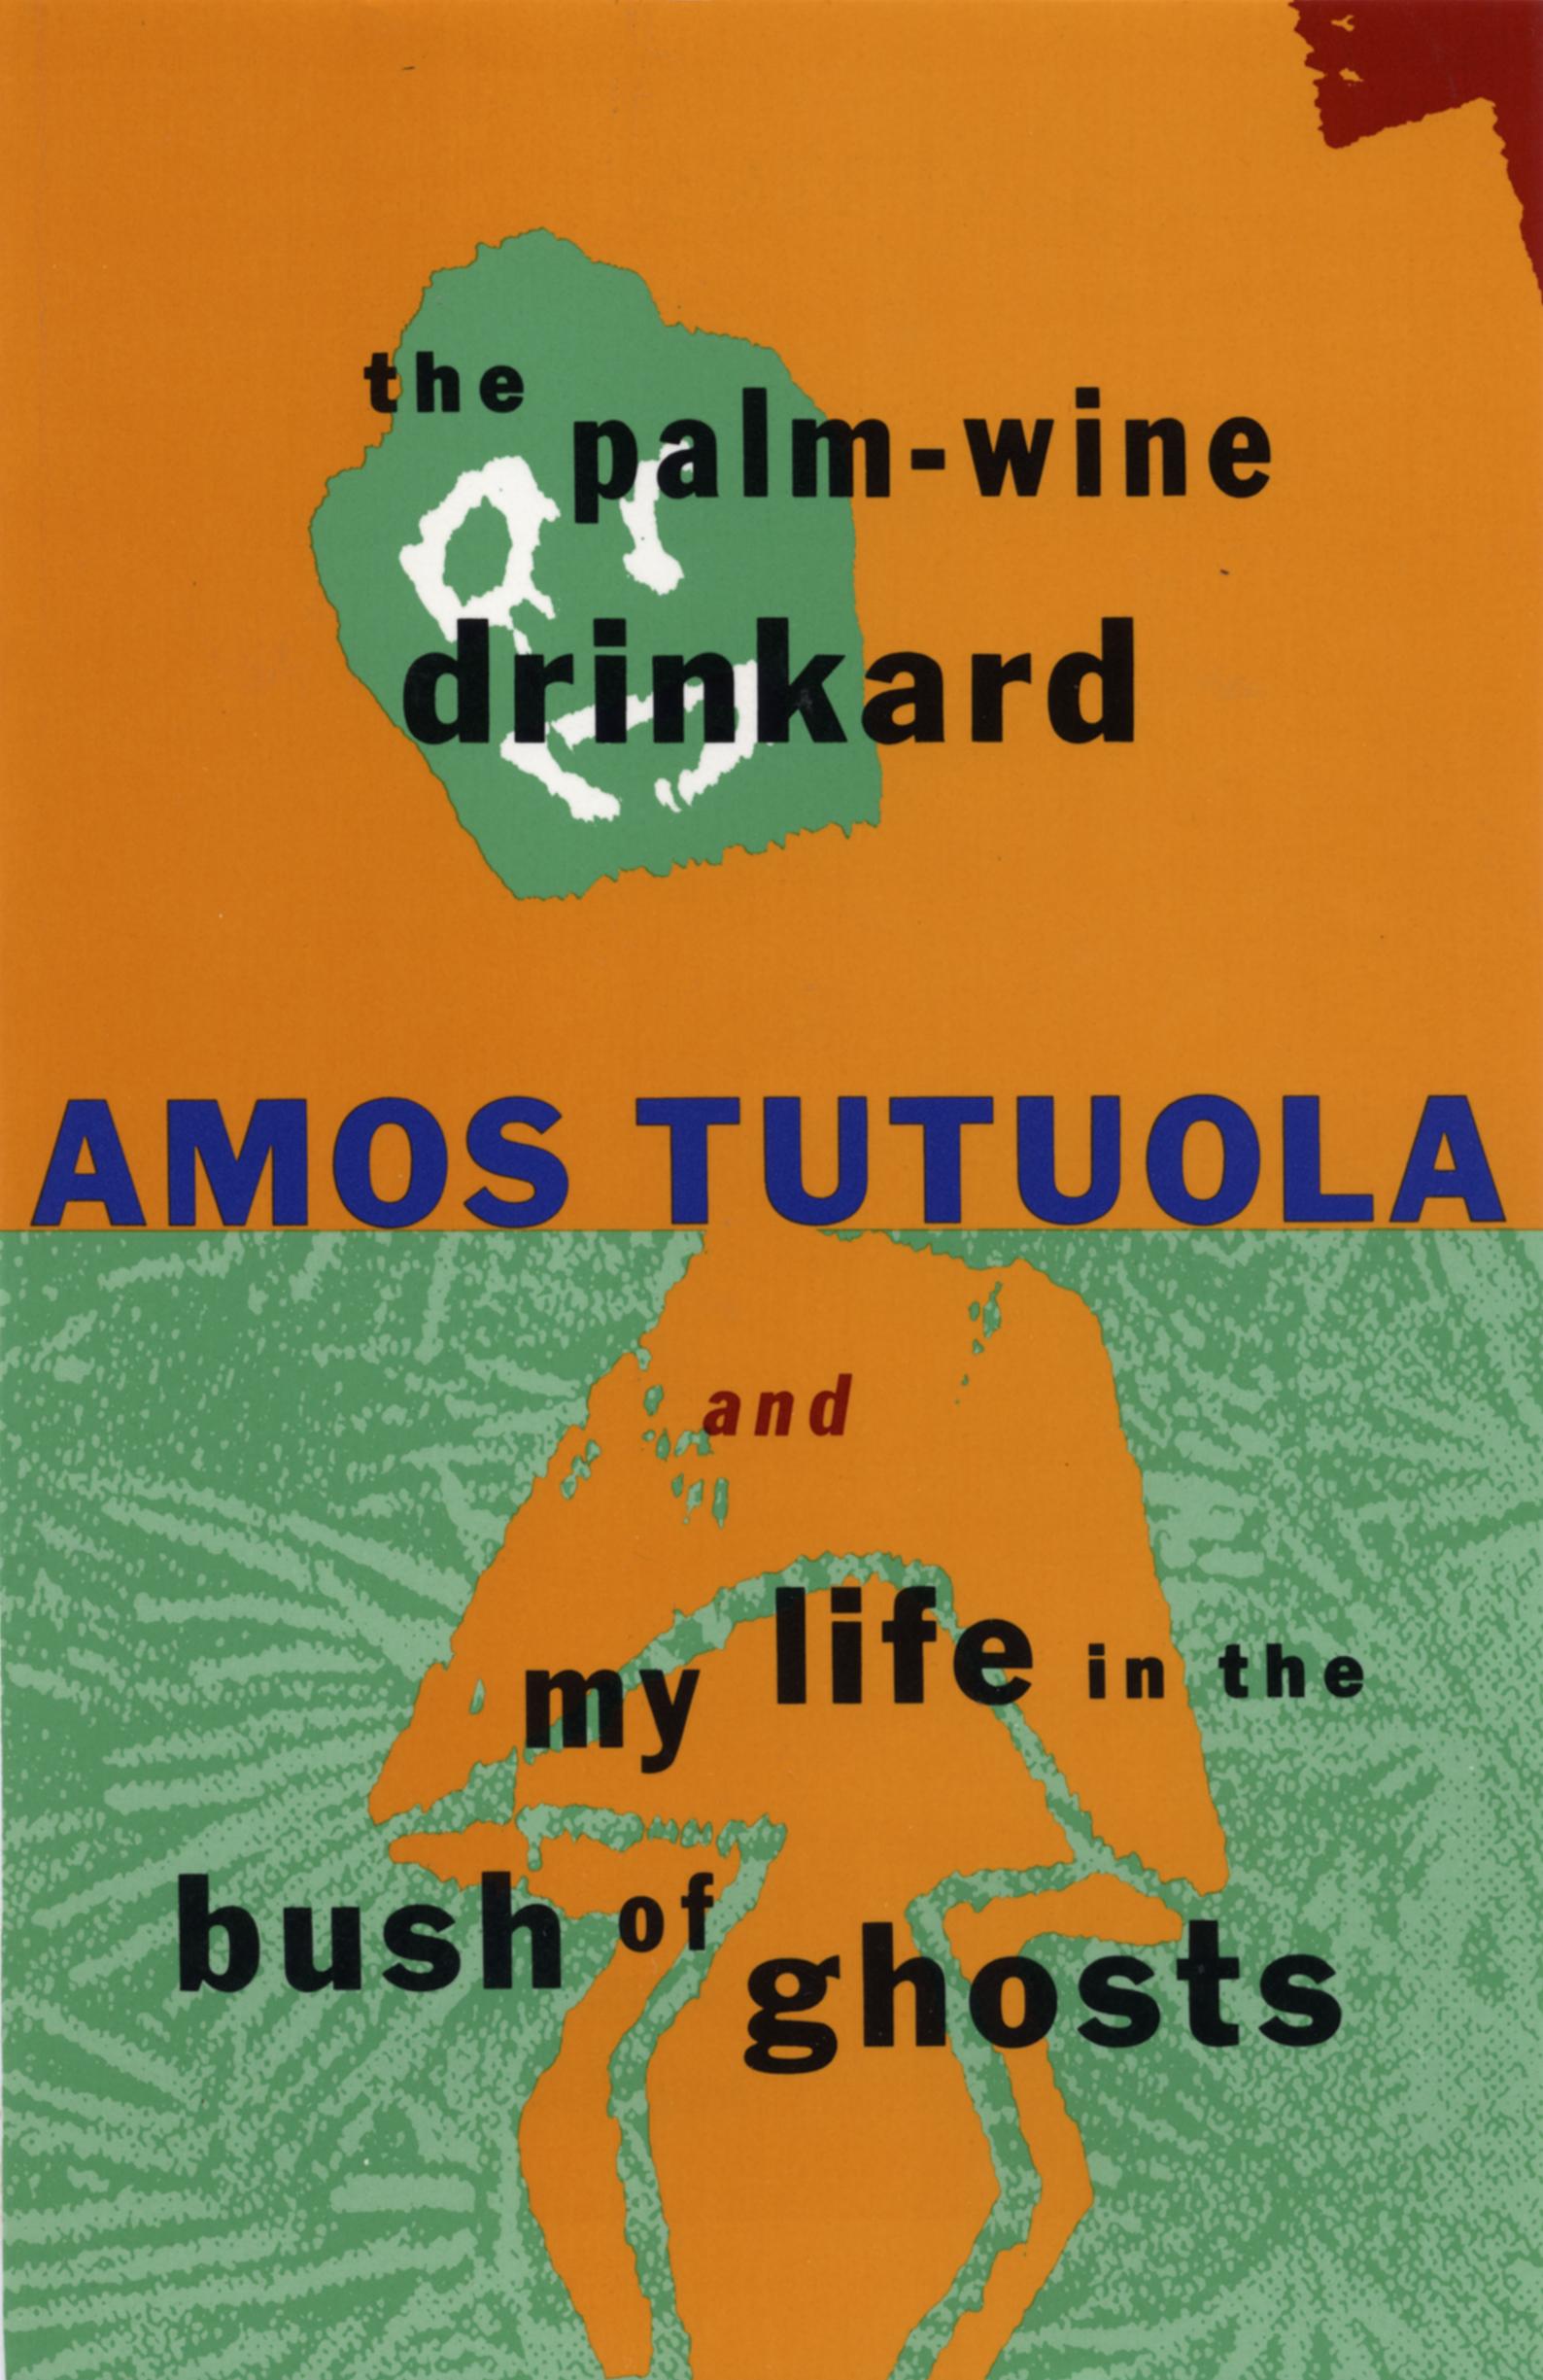 The Palm Wine Drinkard by Amos Tutuola